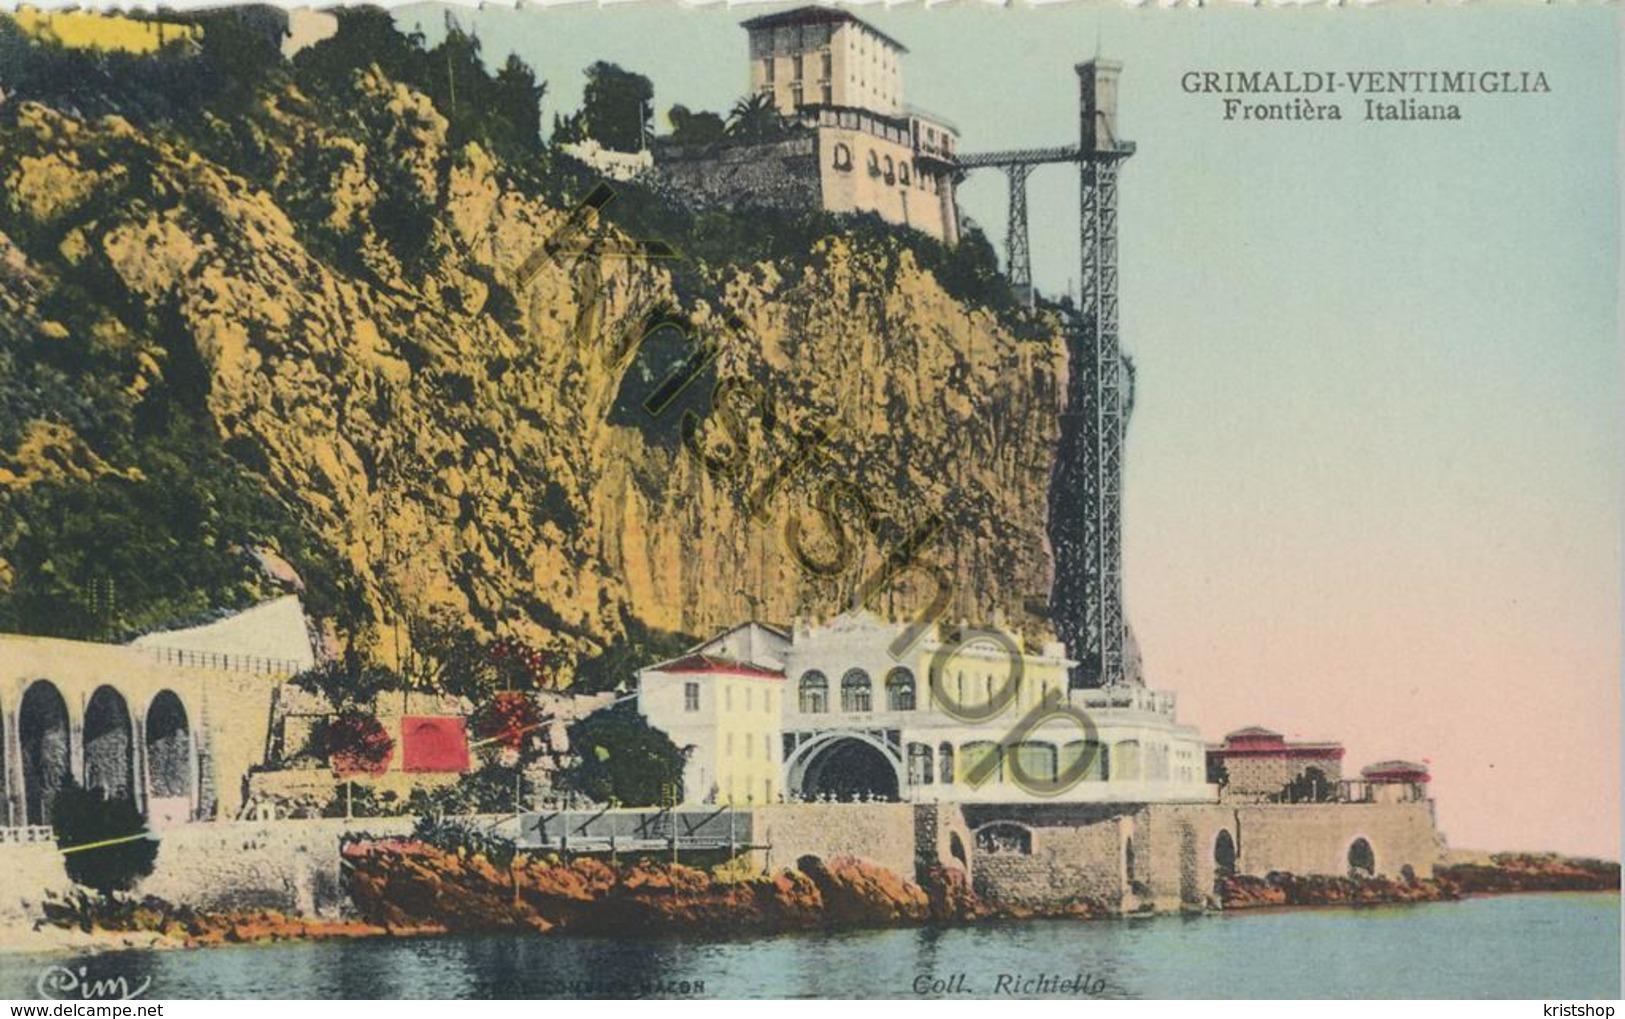 Grimaldi-Ventimiglia - Frontière Italiana [AA20-2.062 - Italie